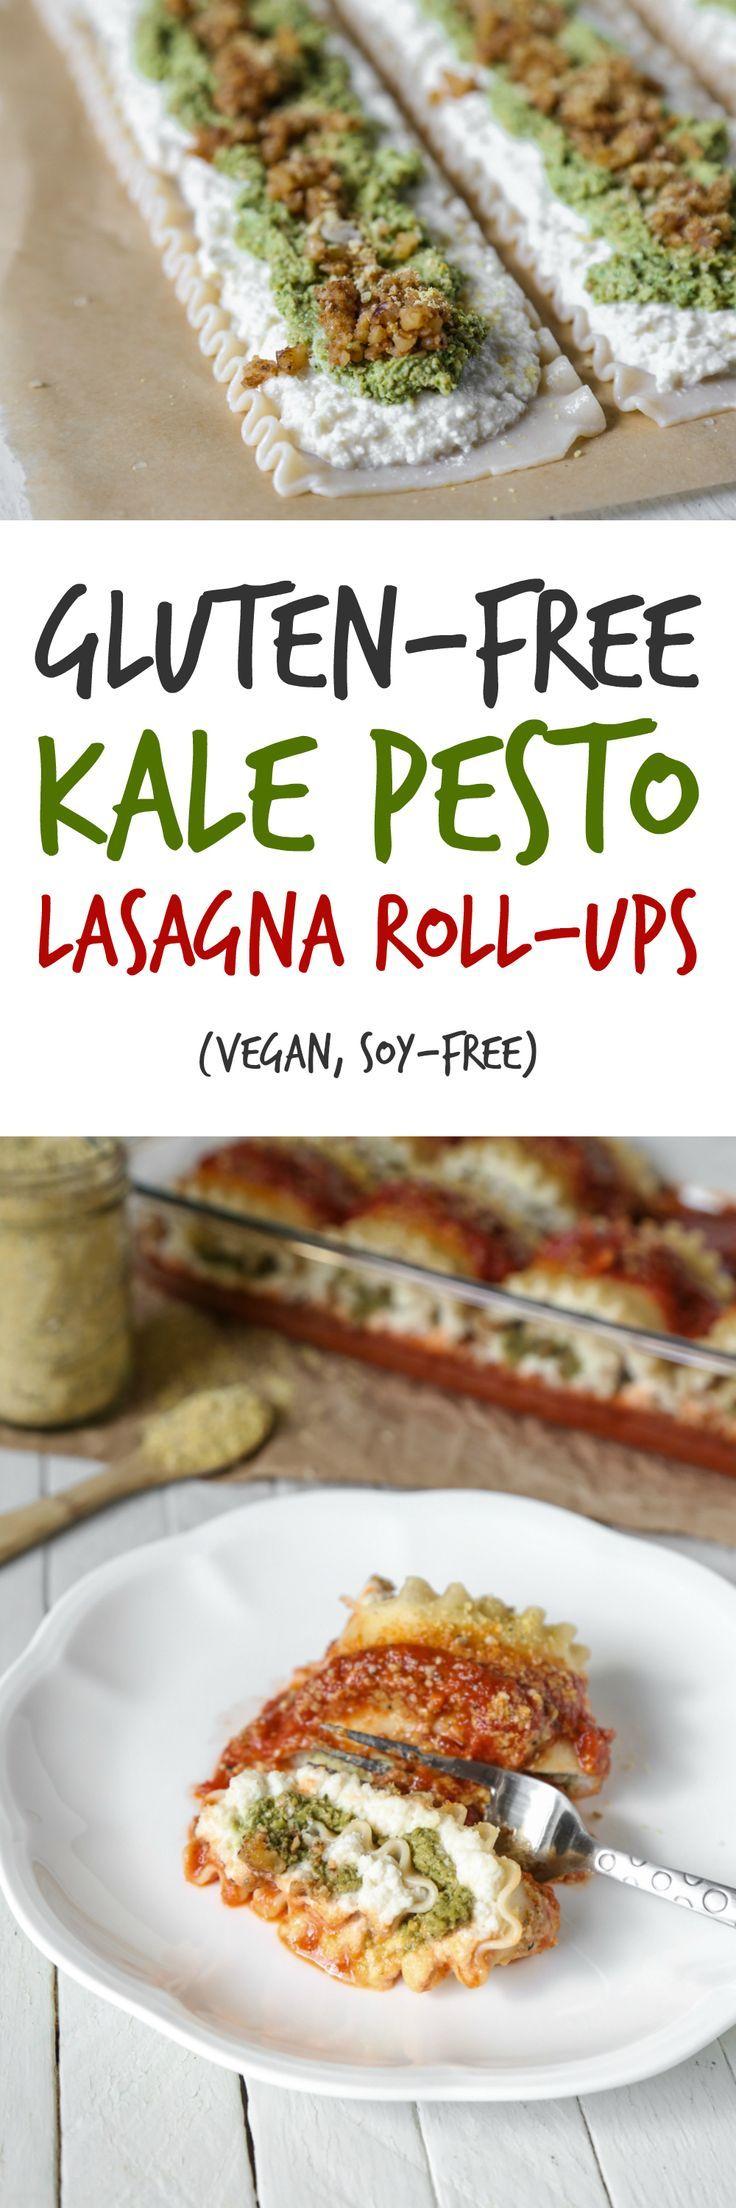 Glutenfree kale pesto lasagna rollups vegan soyfree